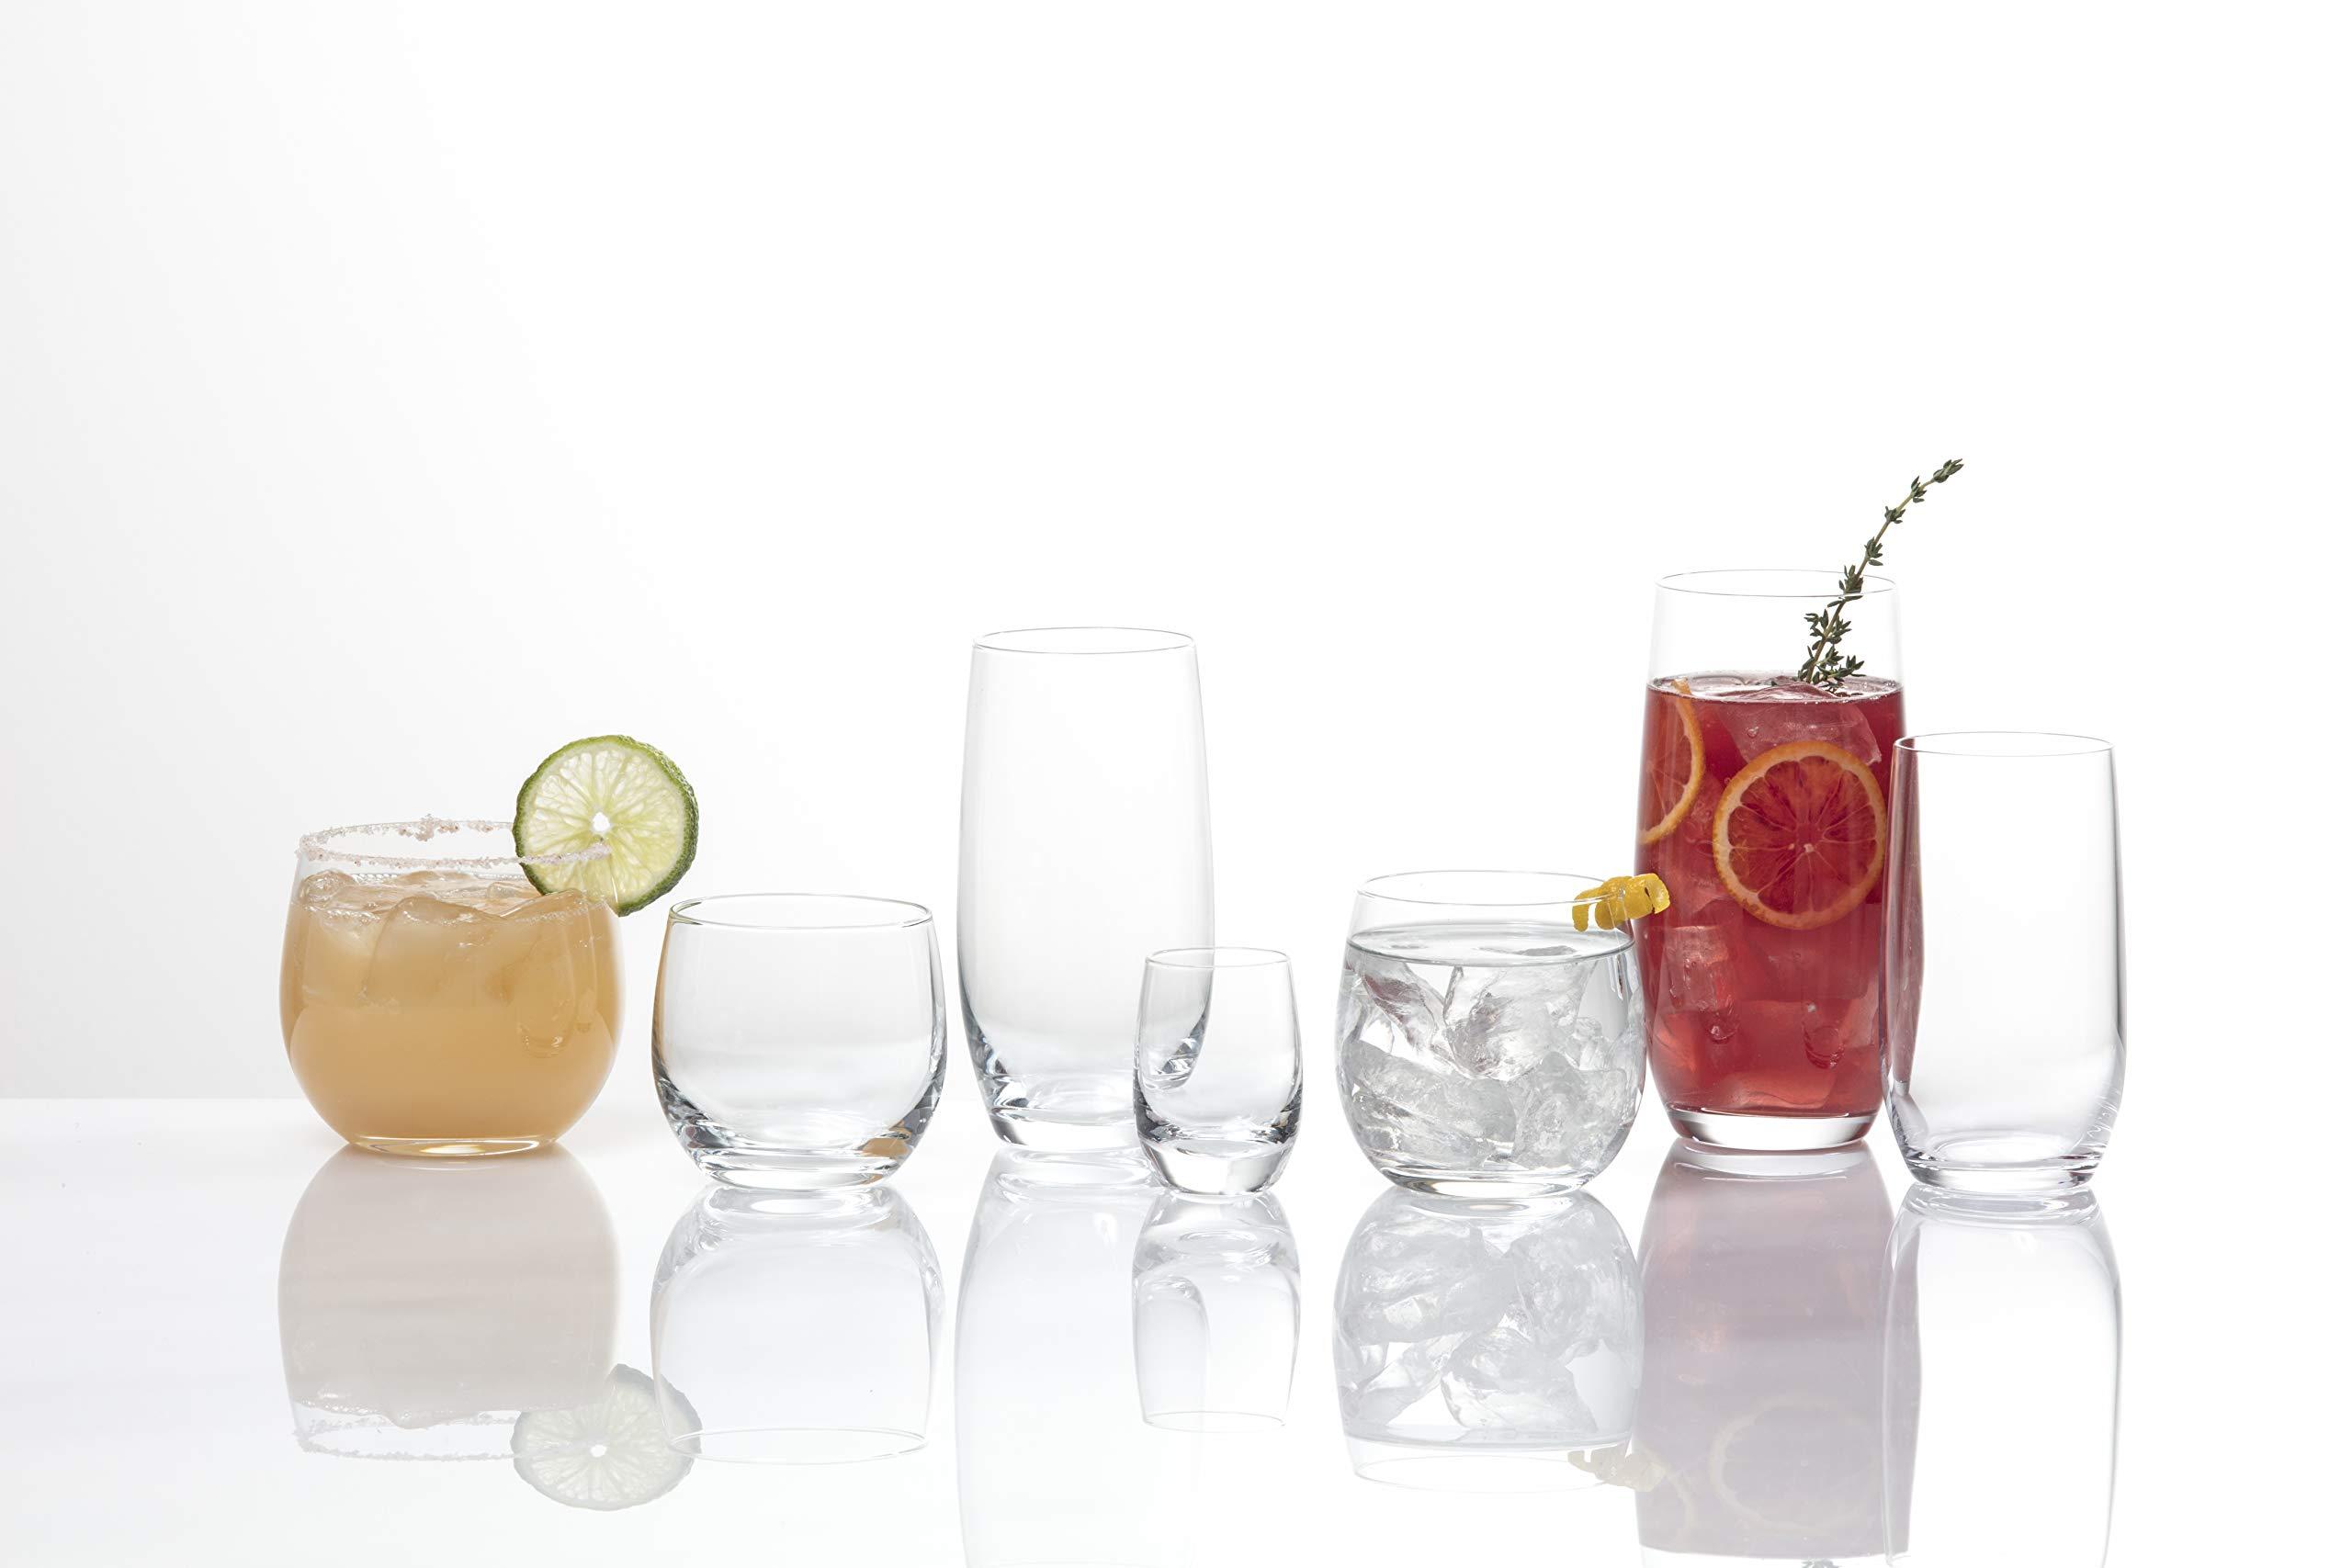 Schott Zwiesel Tritan Crystal Glass Banquet Barware Collection Shot Cocktail Glass, 2-1/2-Ounce, Set of 6